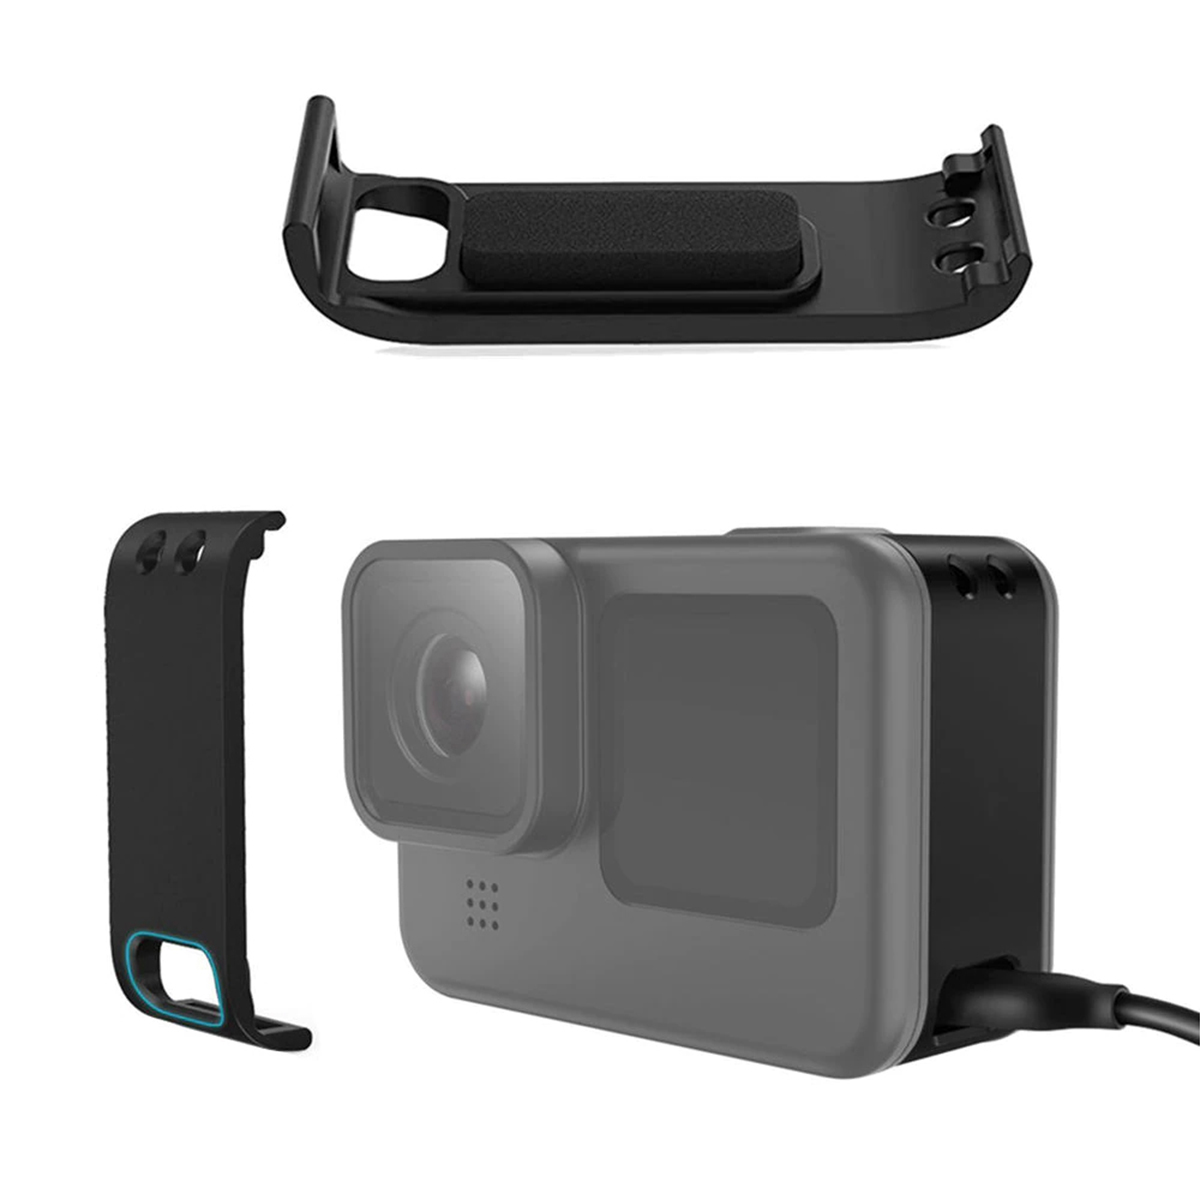 Tampa Lateral para GoPro Hero9 Black com Abertura pra Carregamento - Shoot